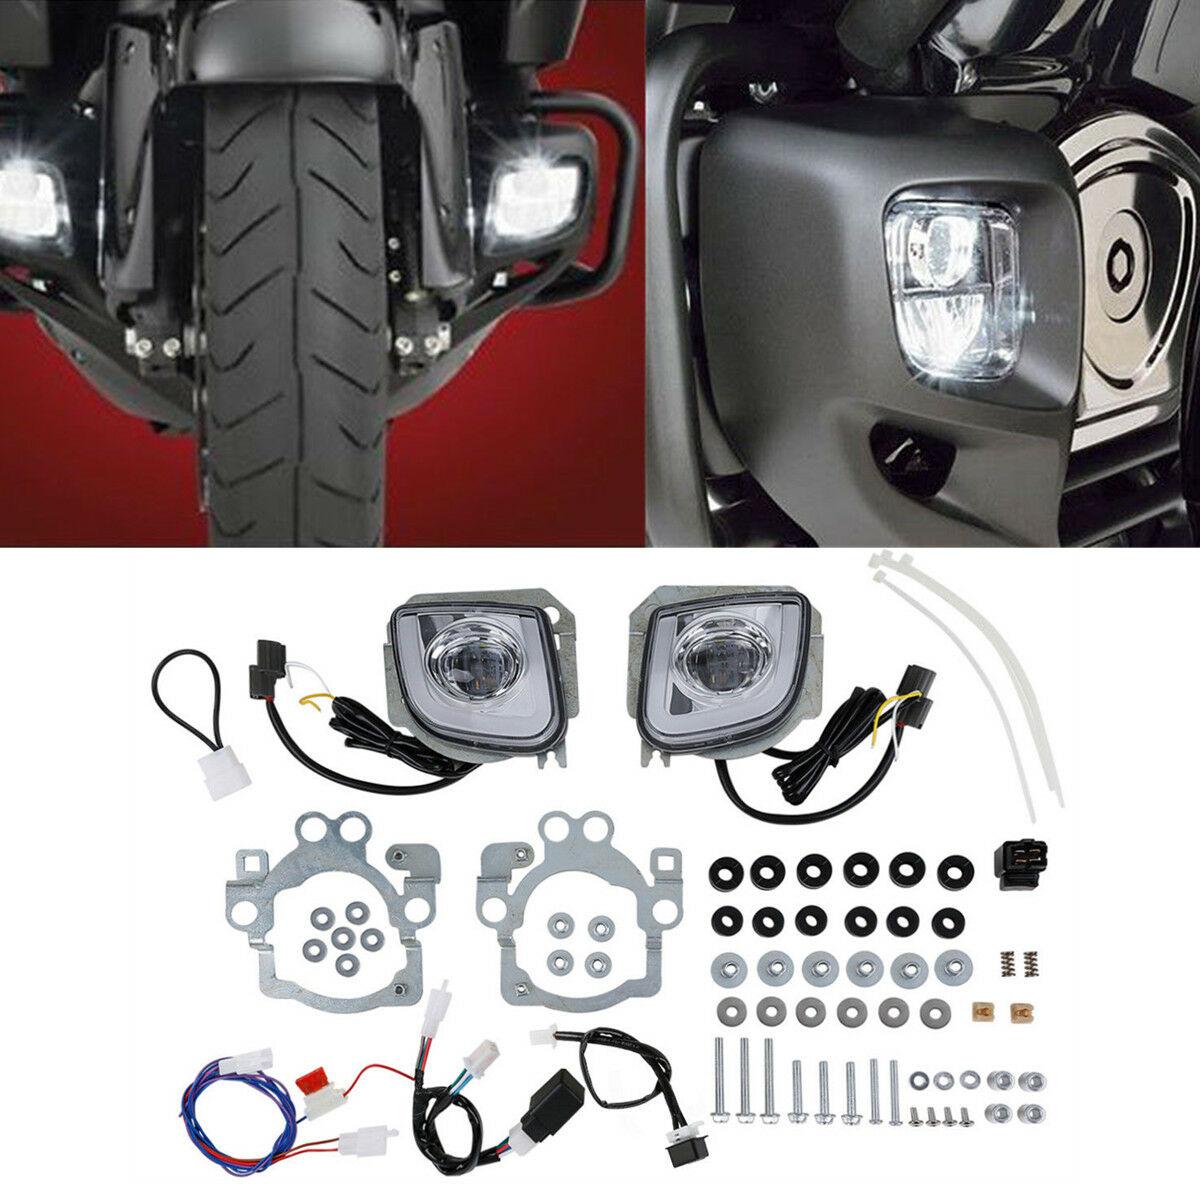 Headlight Headlamp Assembly For Honda Goldwing F6B GL1800 2012-2017 15 16 New